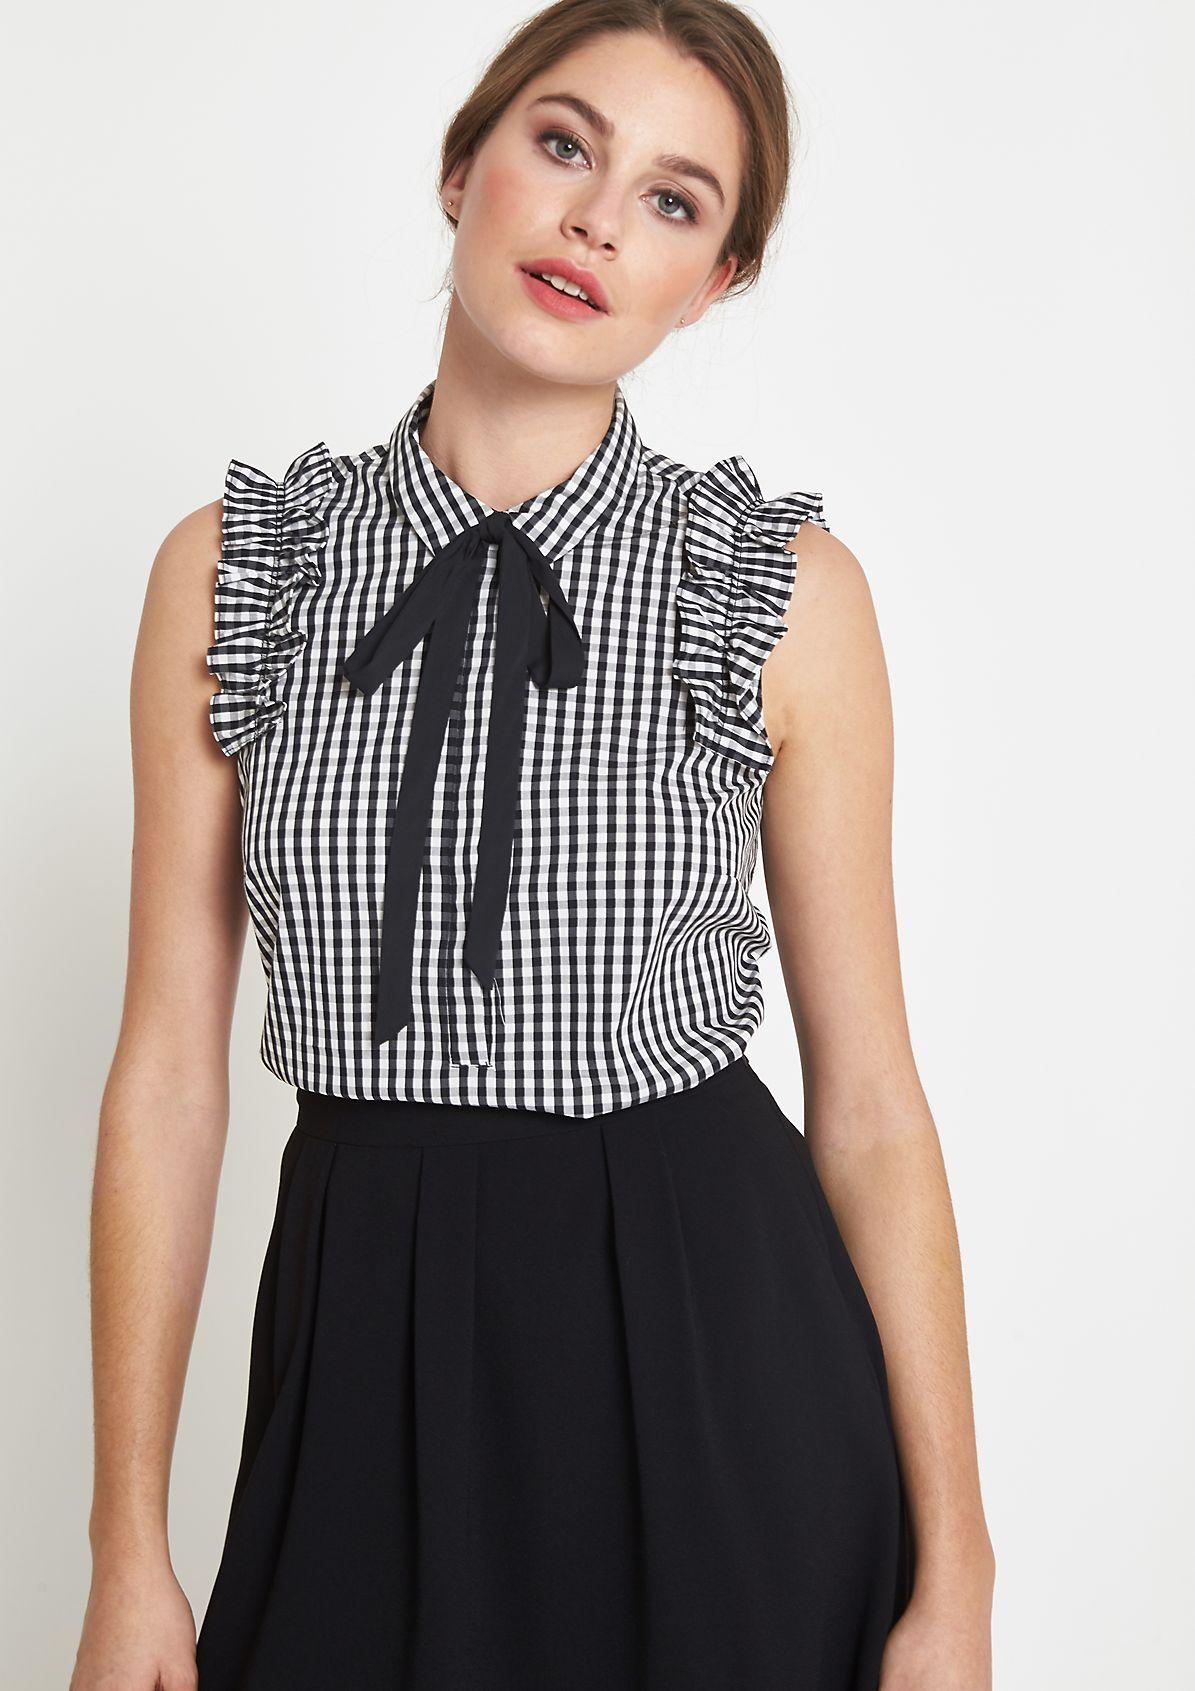 08e8039f3951 Elegant poplin blouse top with ruffle embellishment from comma ...